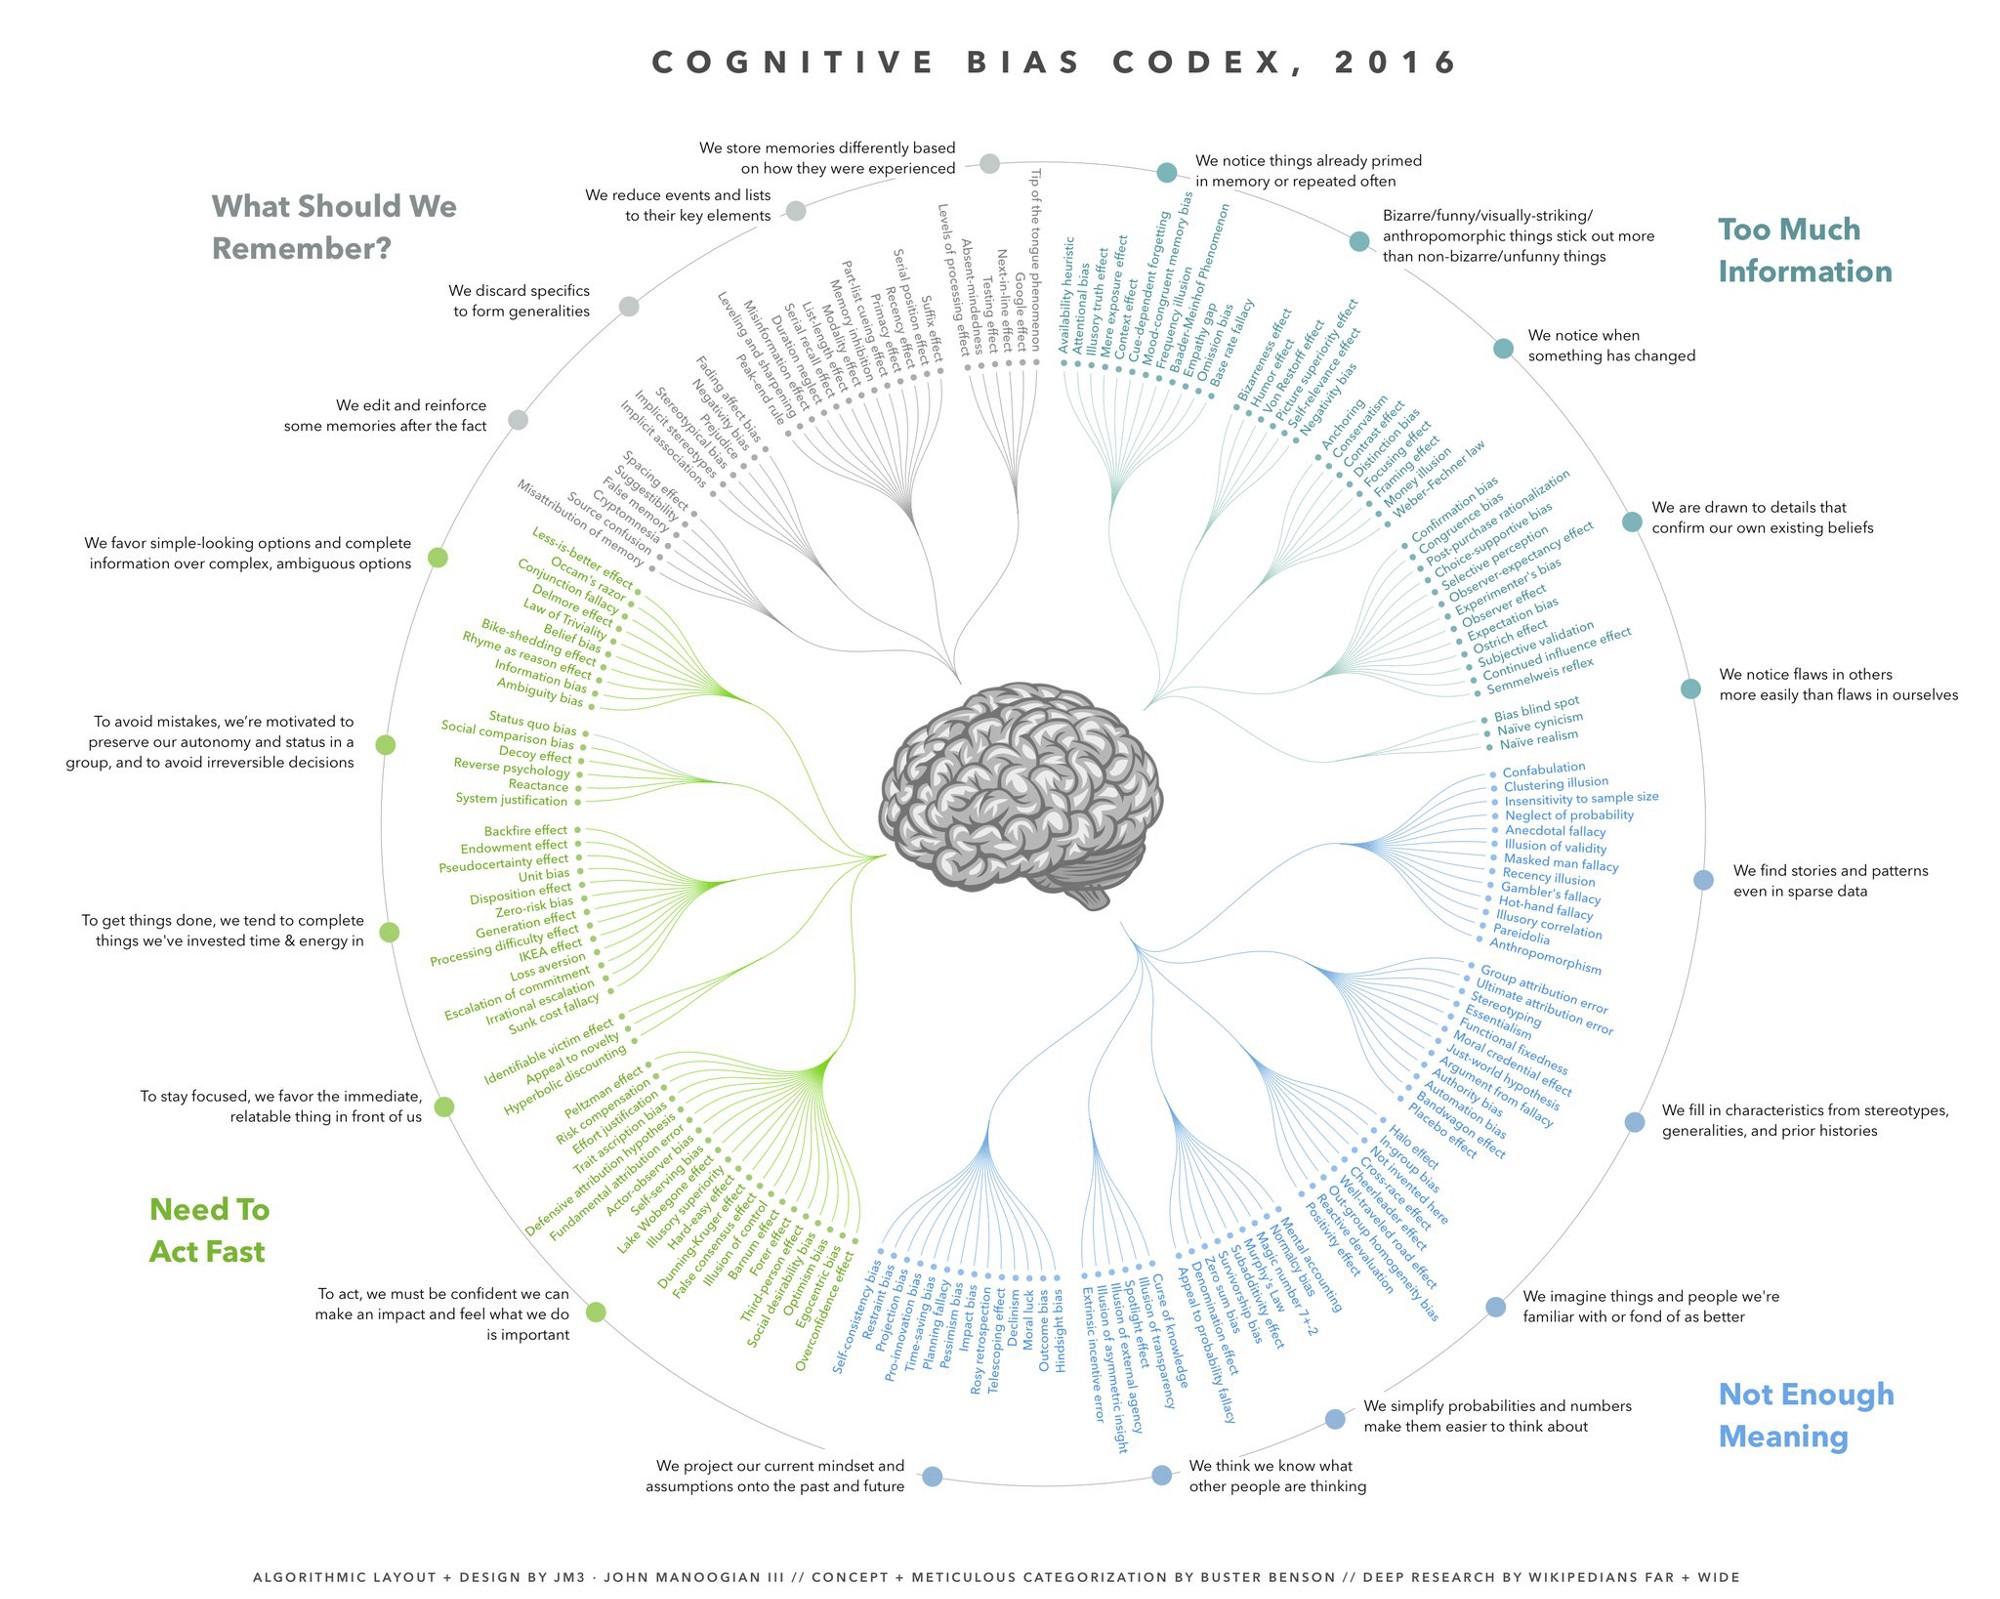 cognitivebiascodex2016